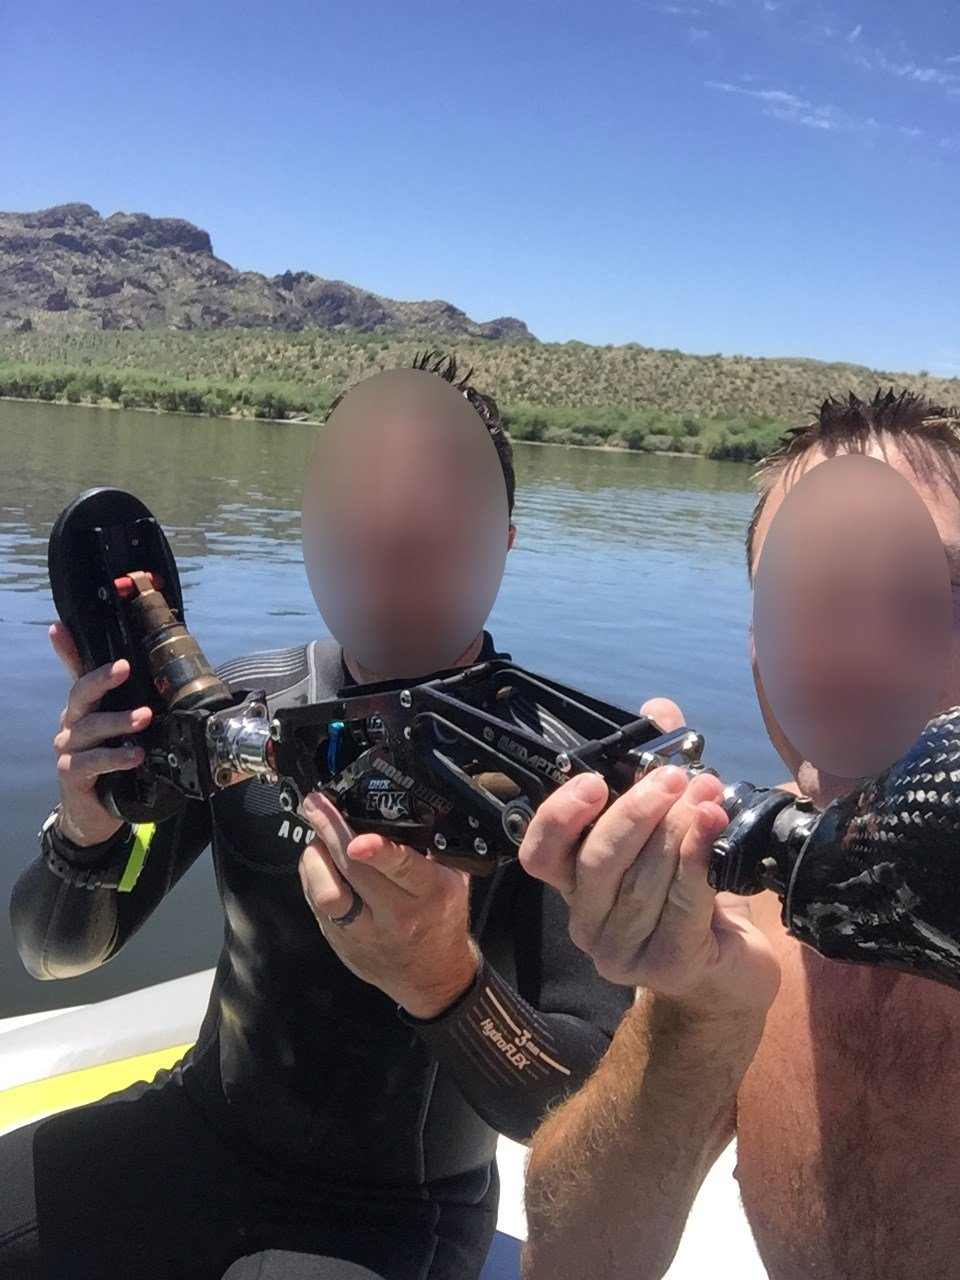 Two strangers found the leg on Wednesday. (Source: Joseph Roybal)